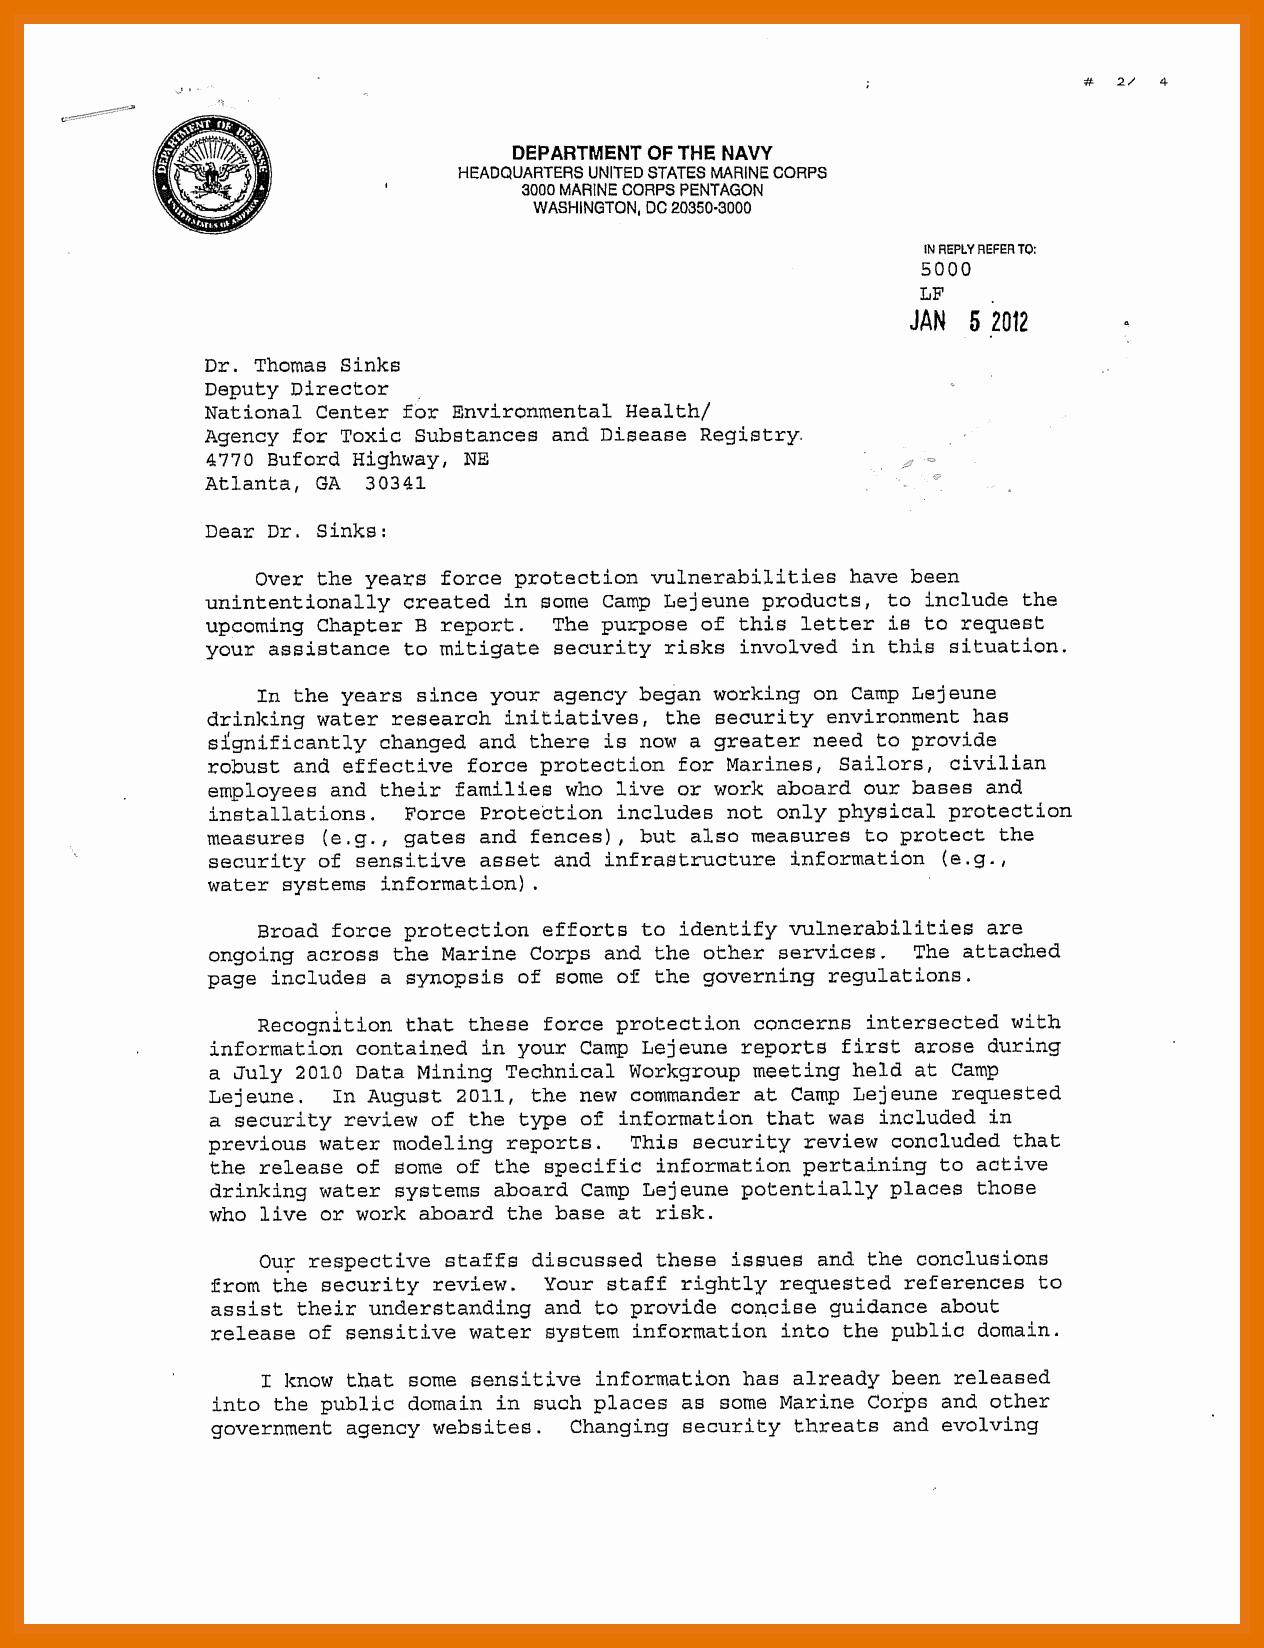 Standard Navy Letter Template New 5 6 Naval Letter format